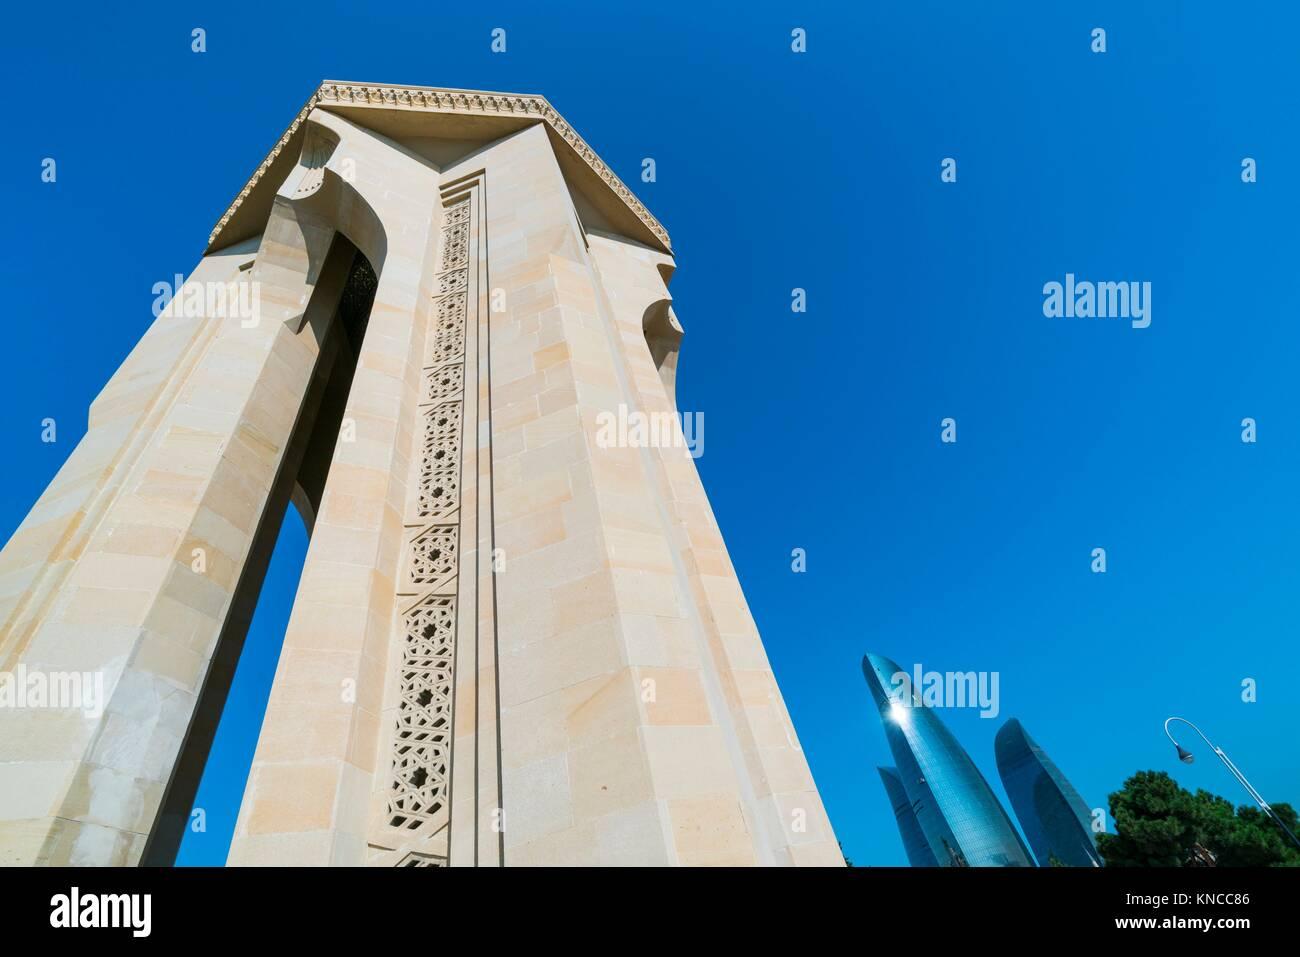 Flame Towers, Martyrs' Lane - Alley of Martyrs, Kirov Park, Baku City, Azerbaijan, Middle East. Stock Photo